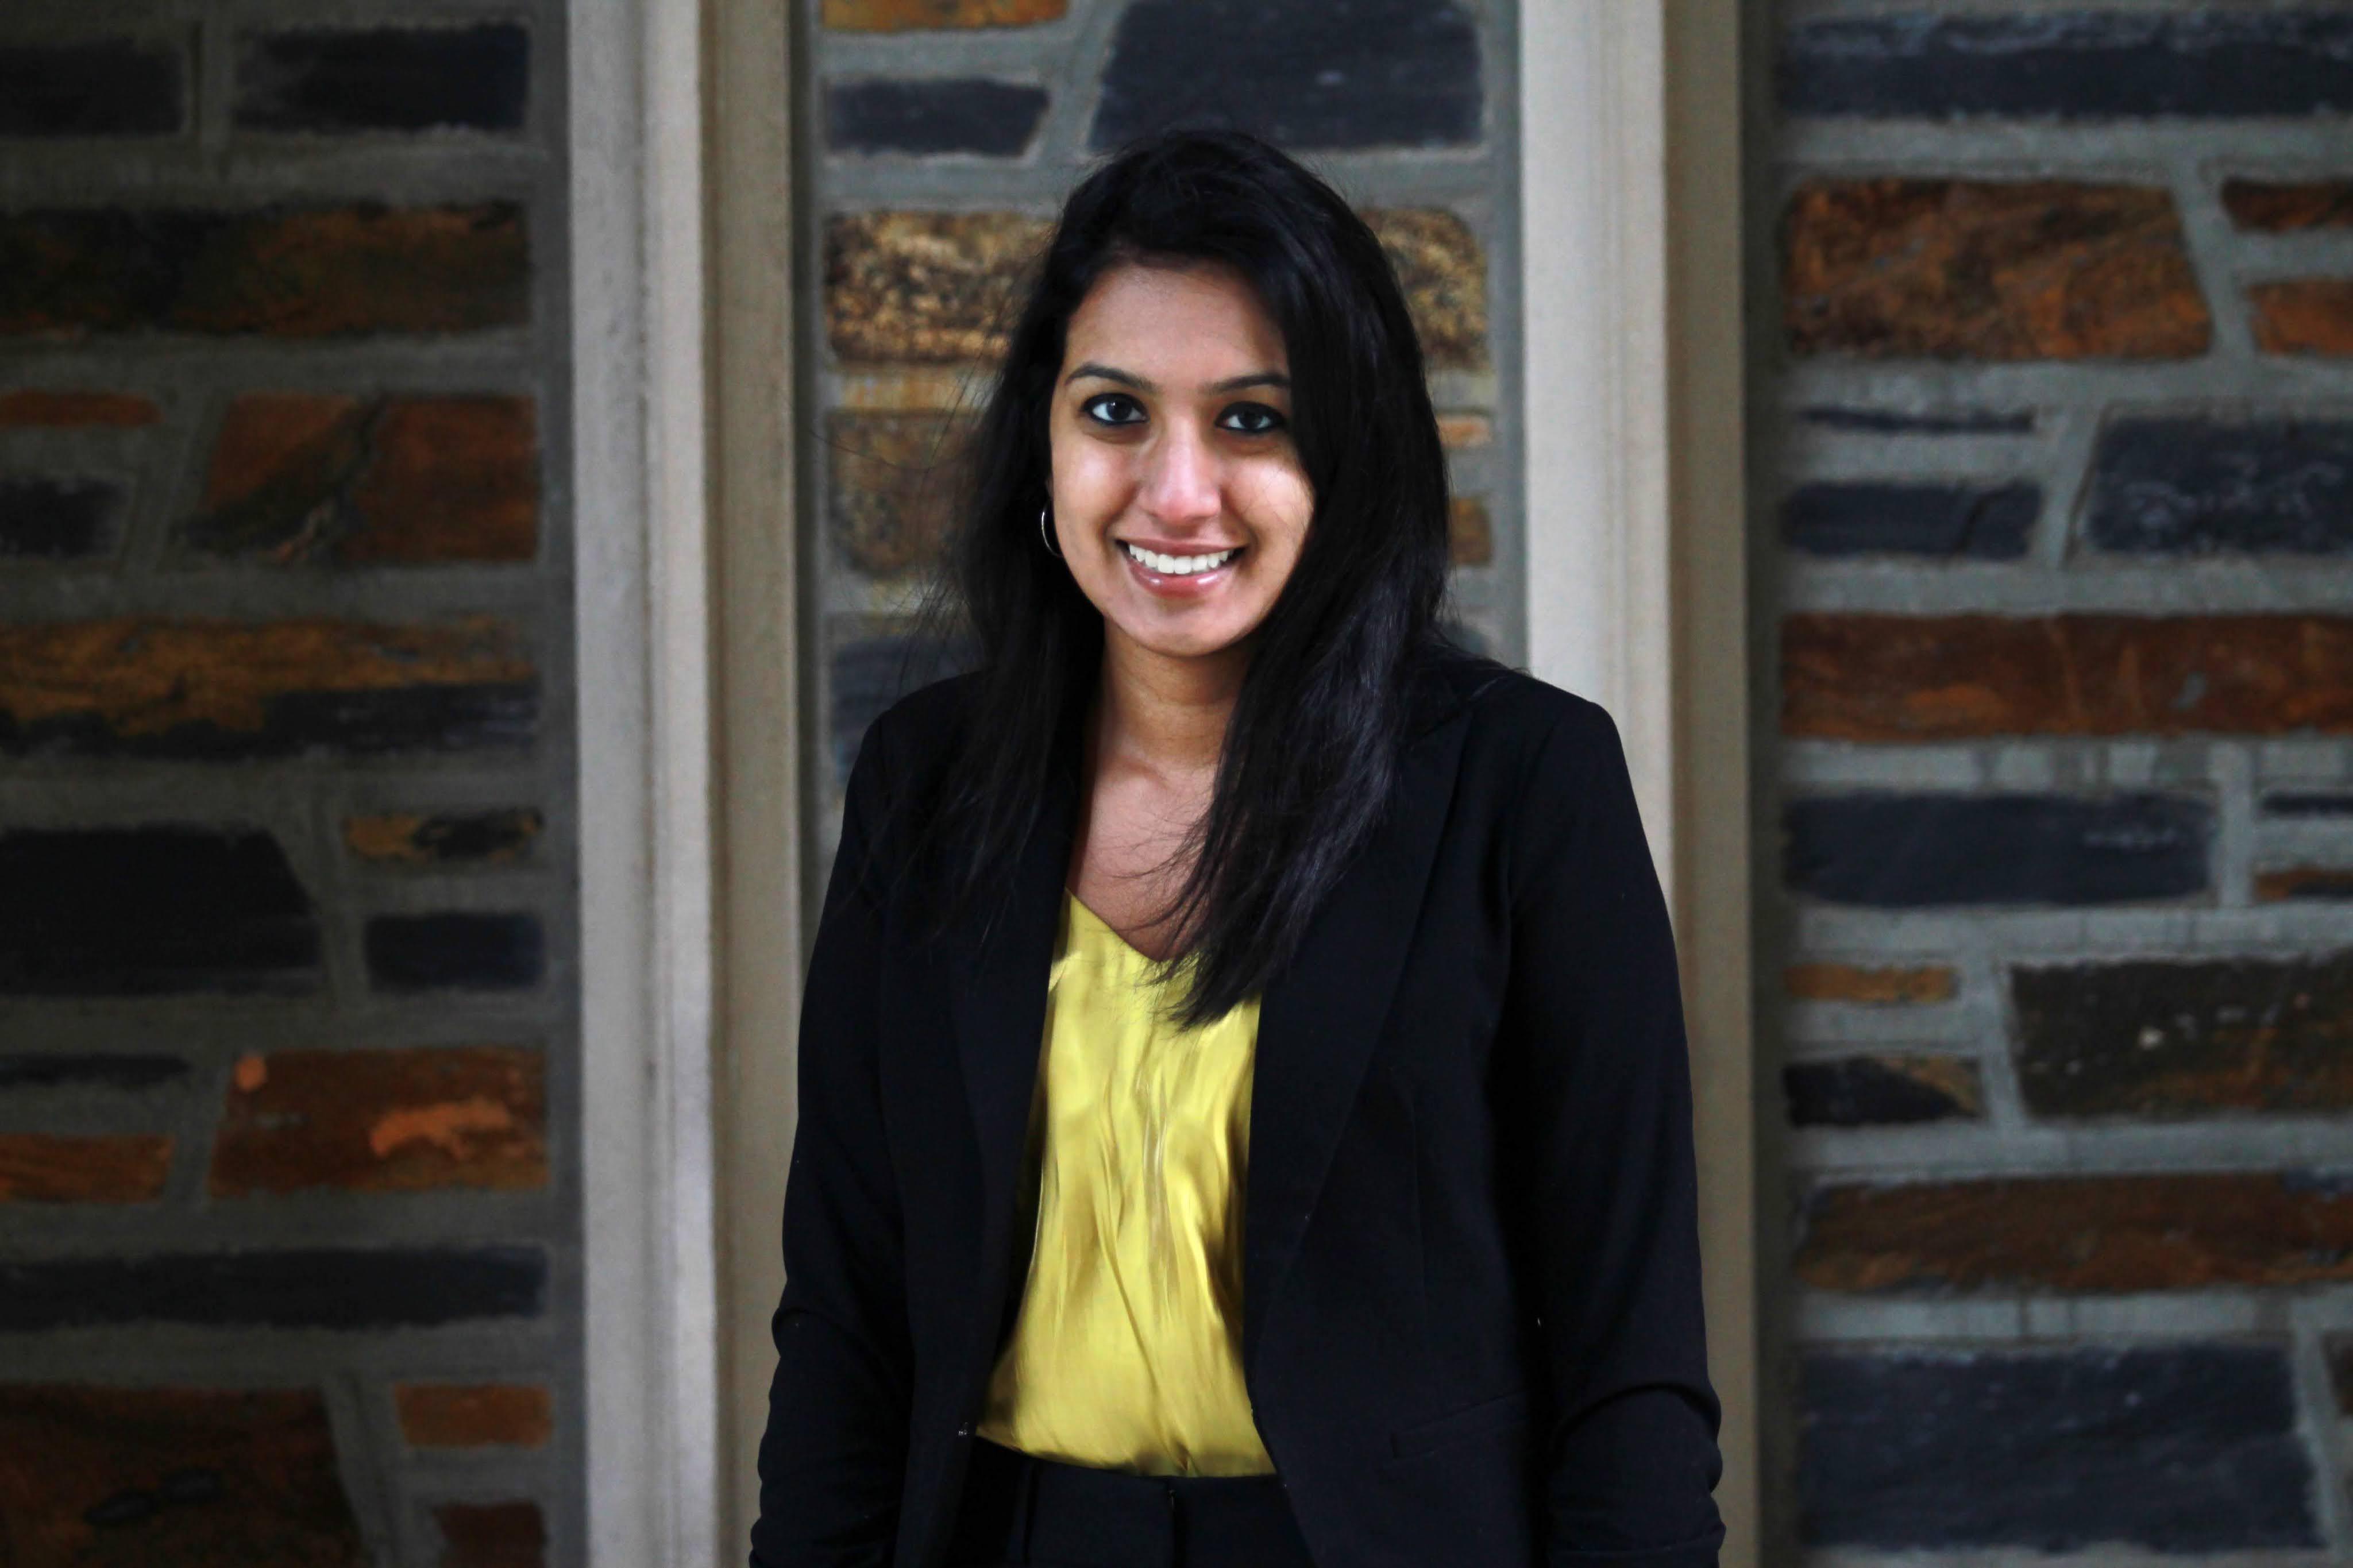 Meghna Mahadevan